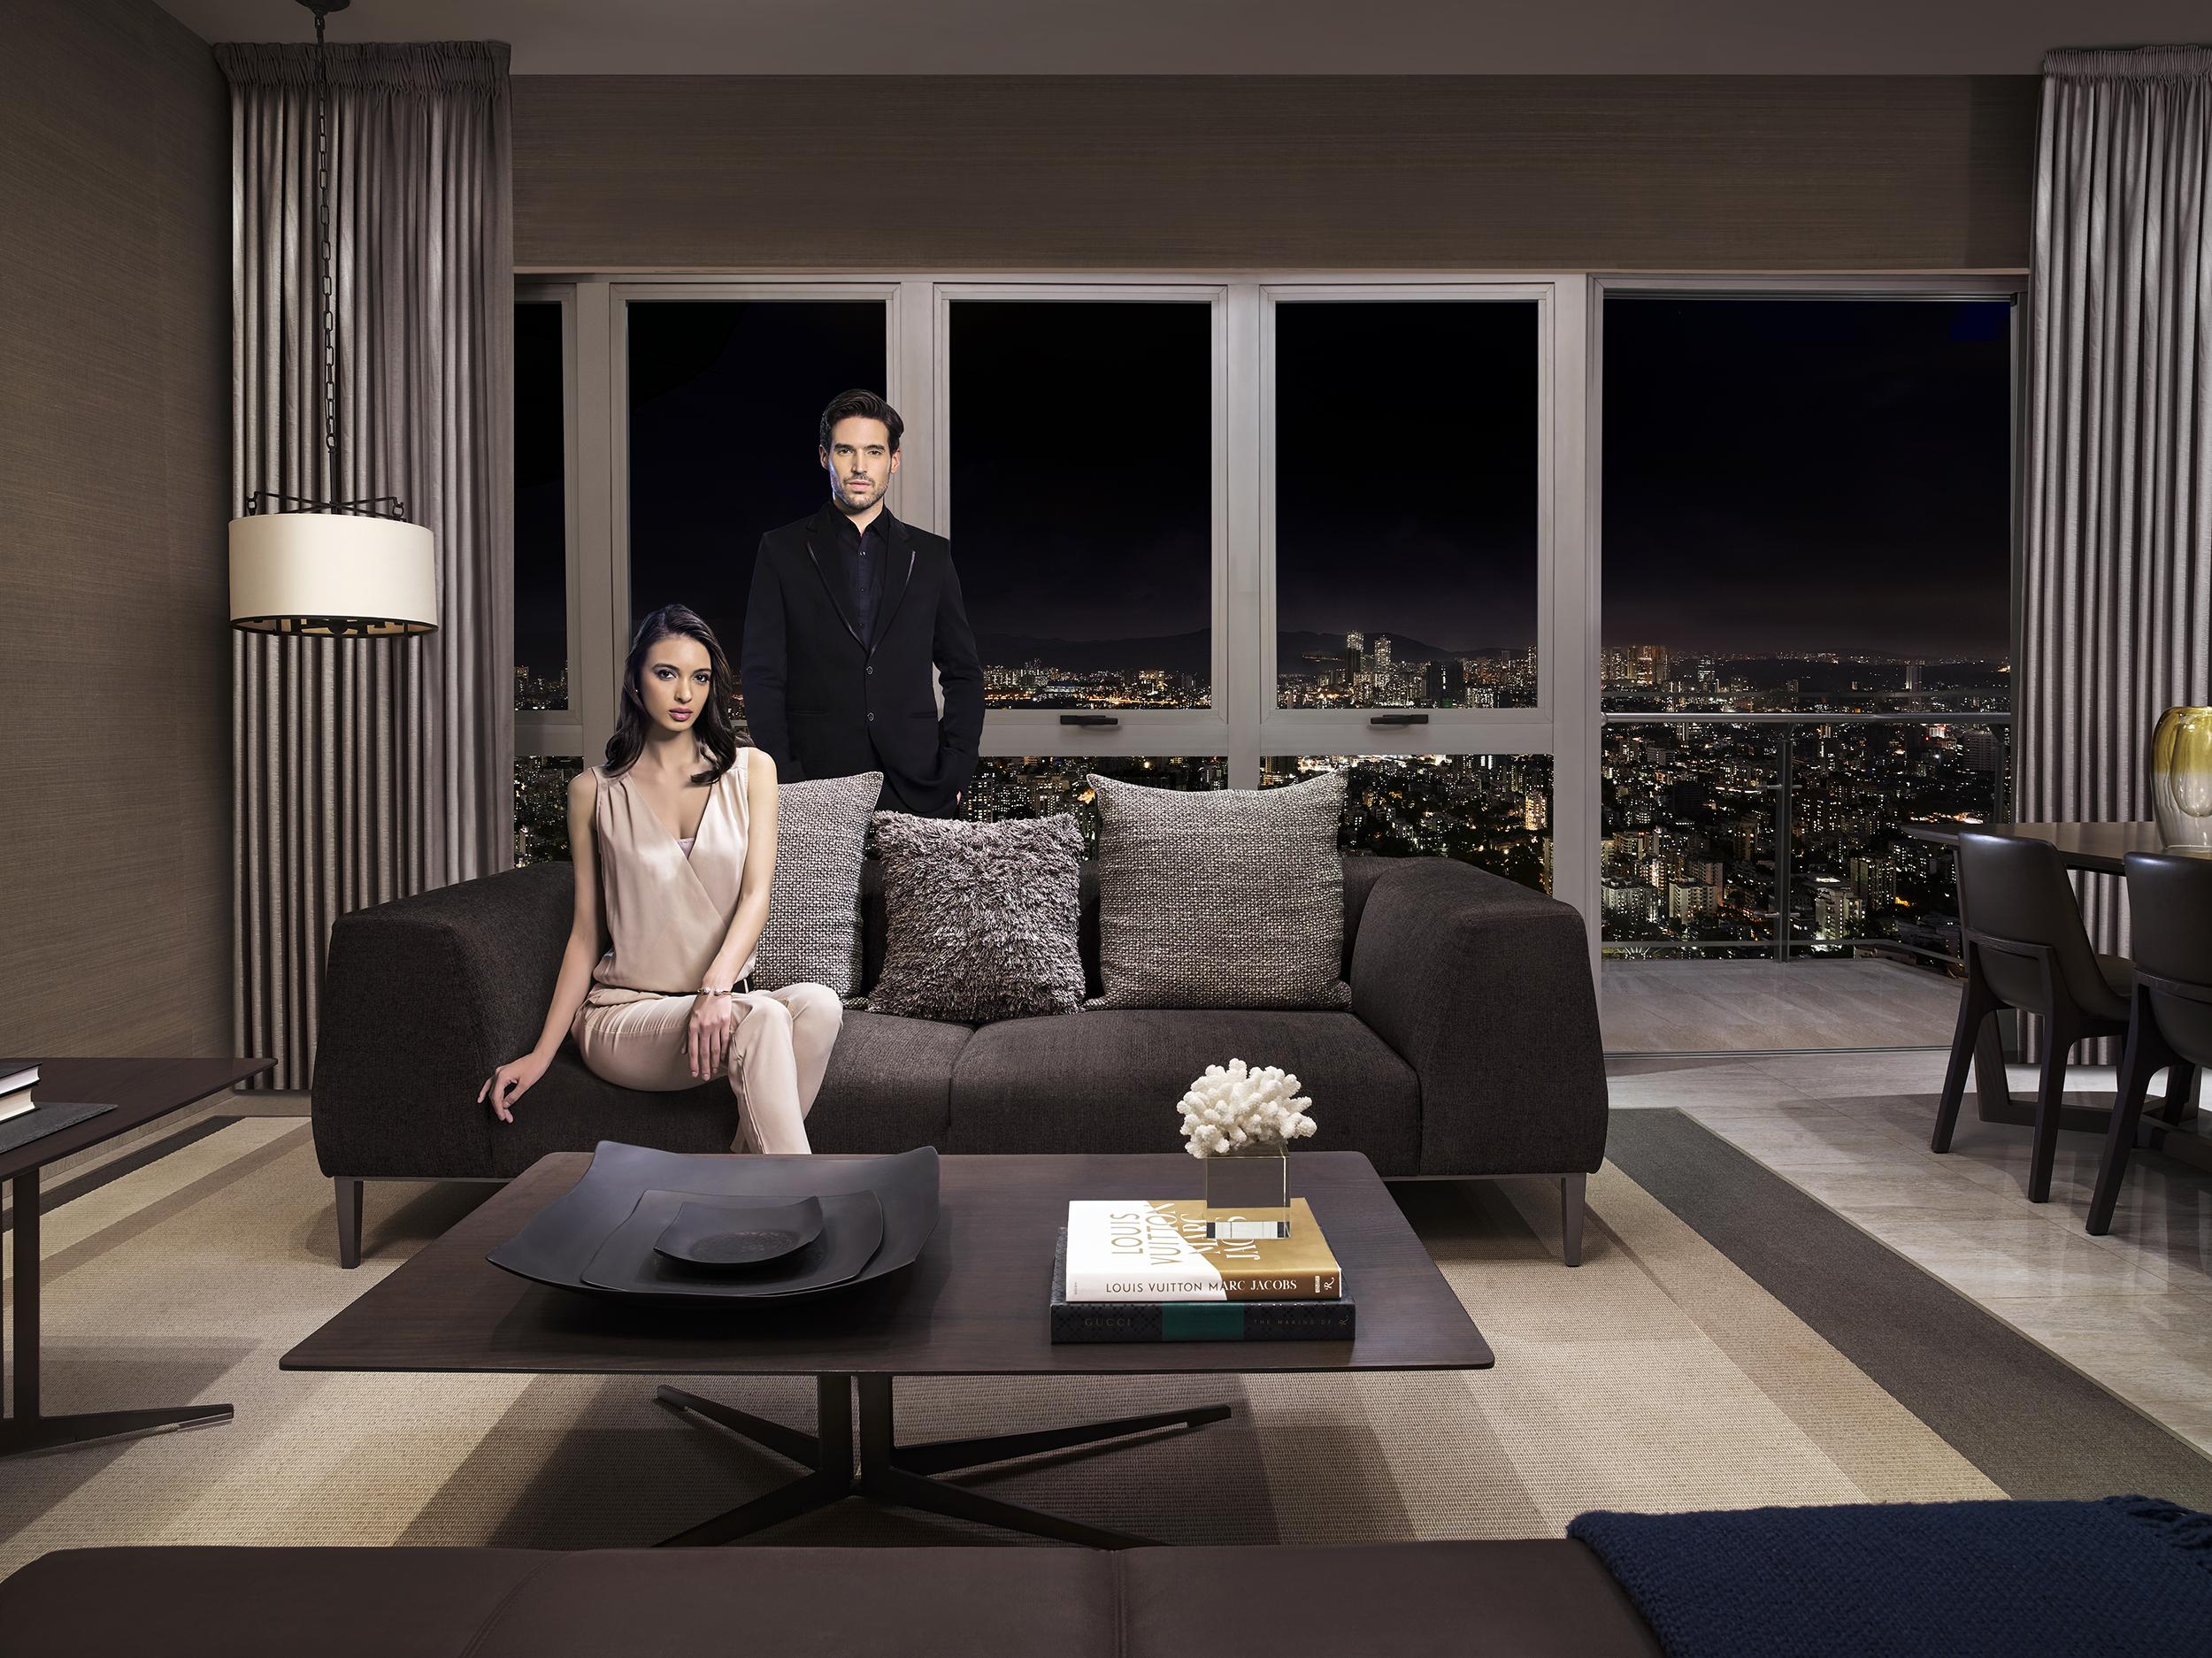 SAS_Livingroom1_356290.jpg